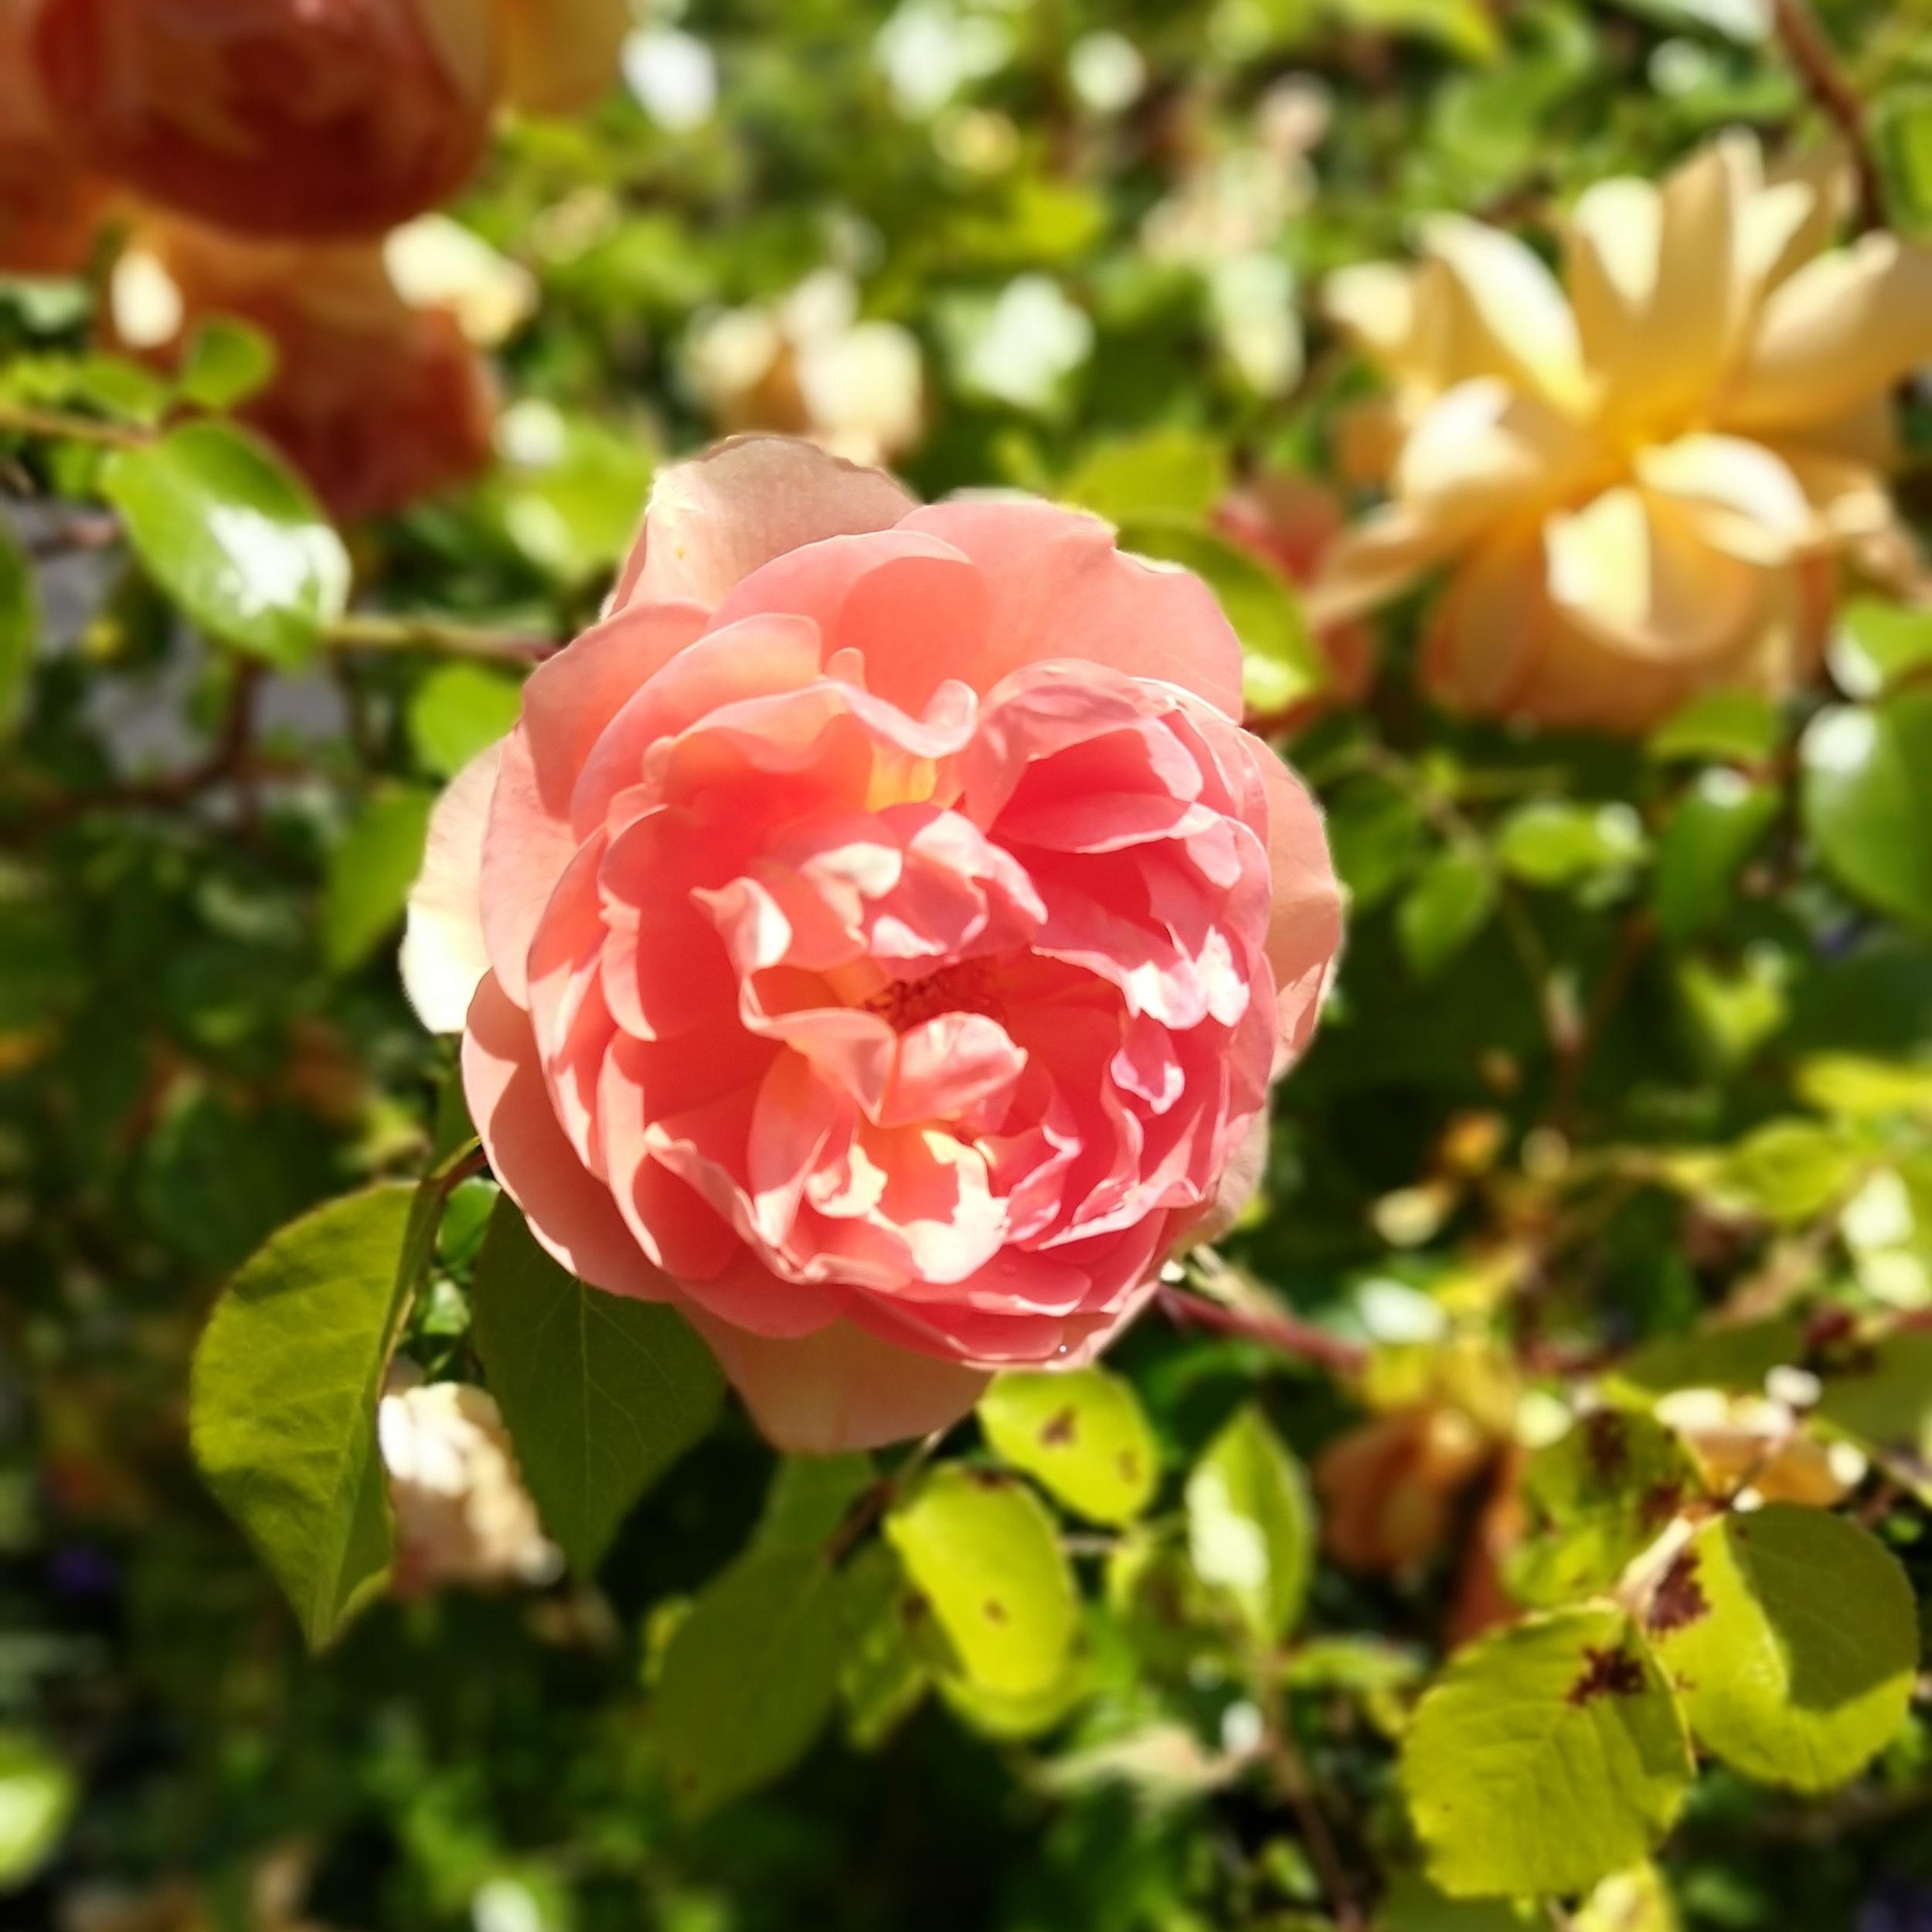 A rose in my neighborhood, photo taken 5.23.19